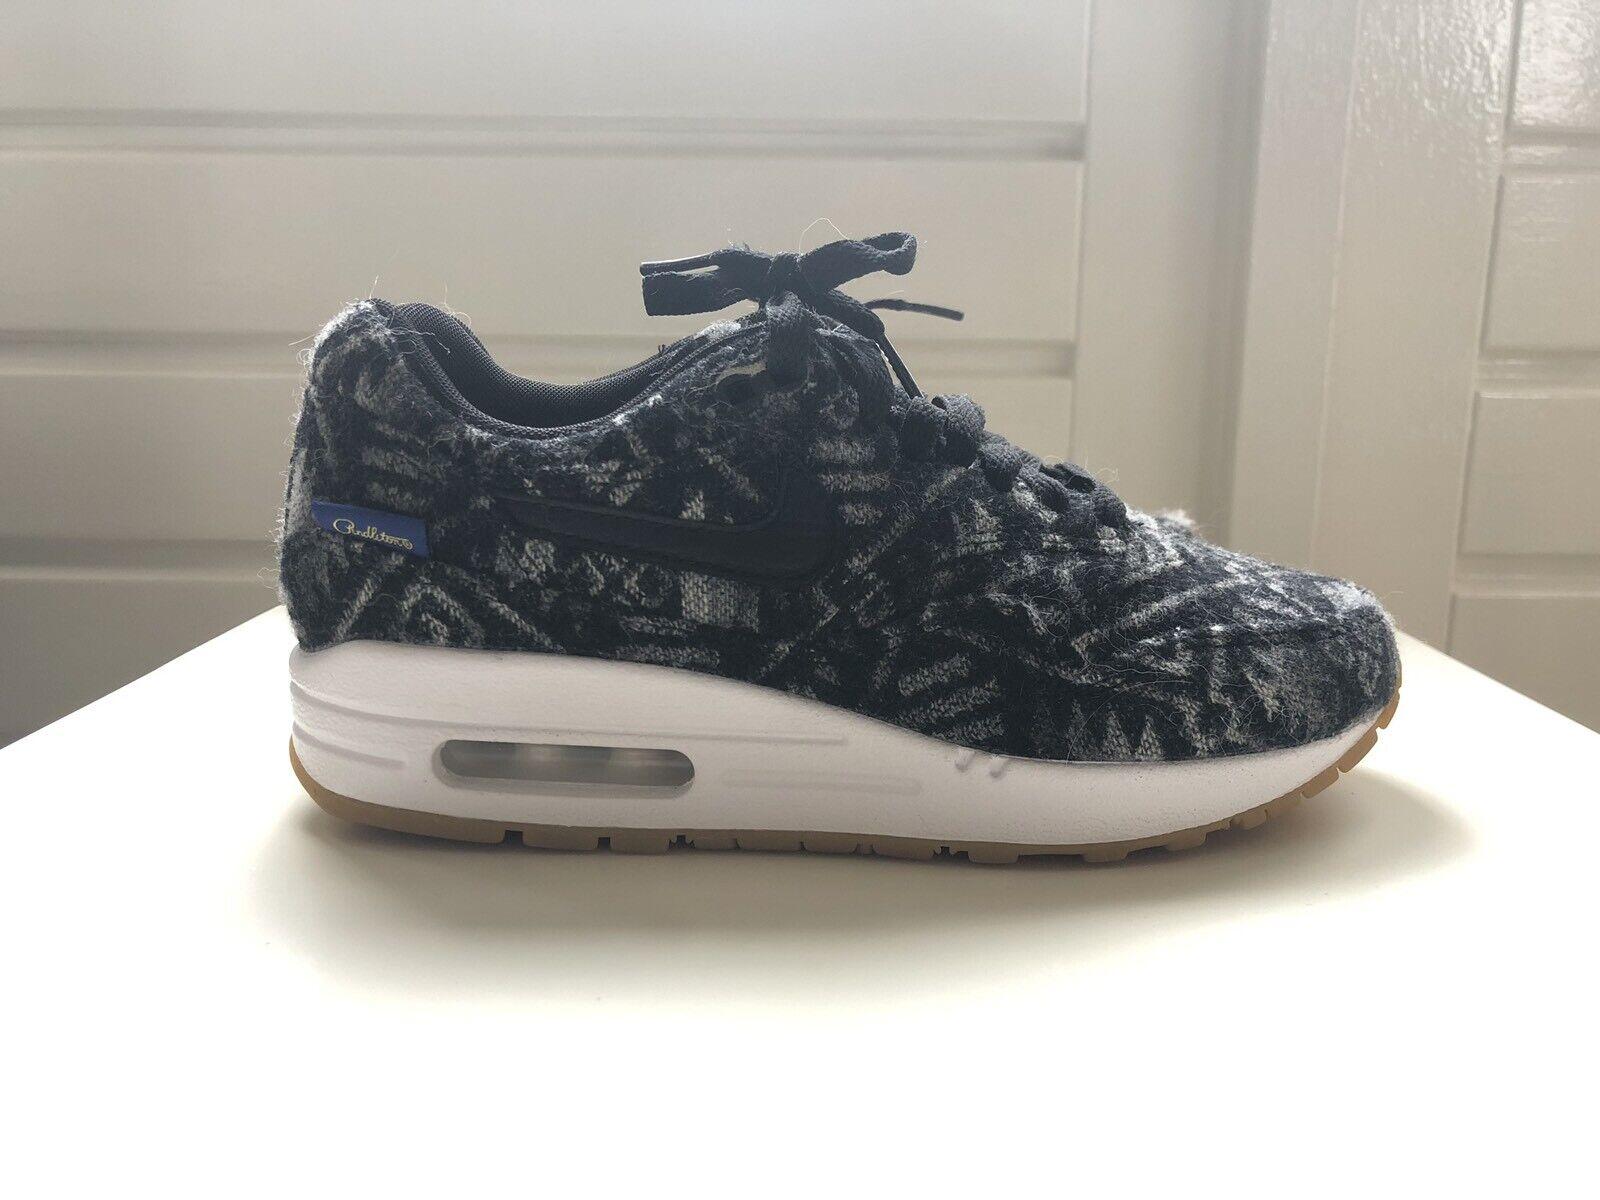 Nike Air max 1 Premium Pendleton Taille EU 36 (supreme, Off blanc)